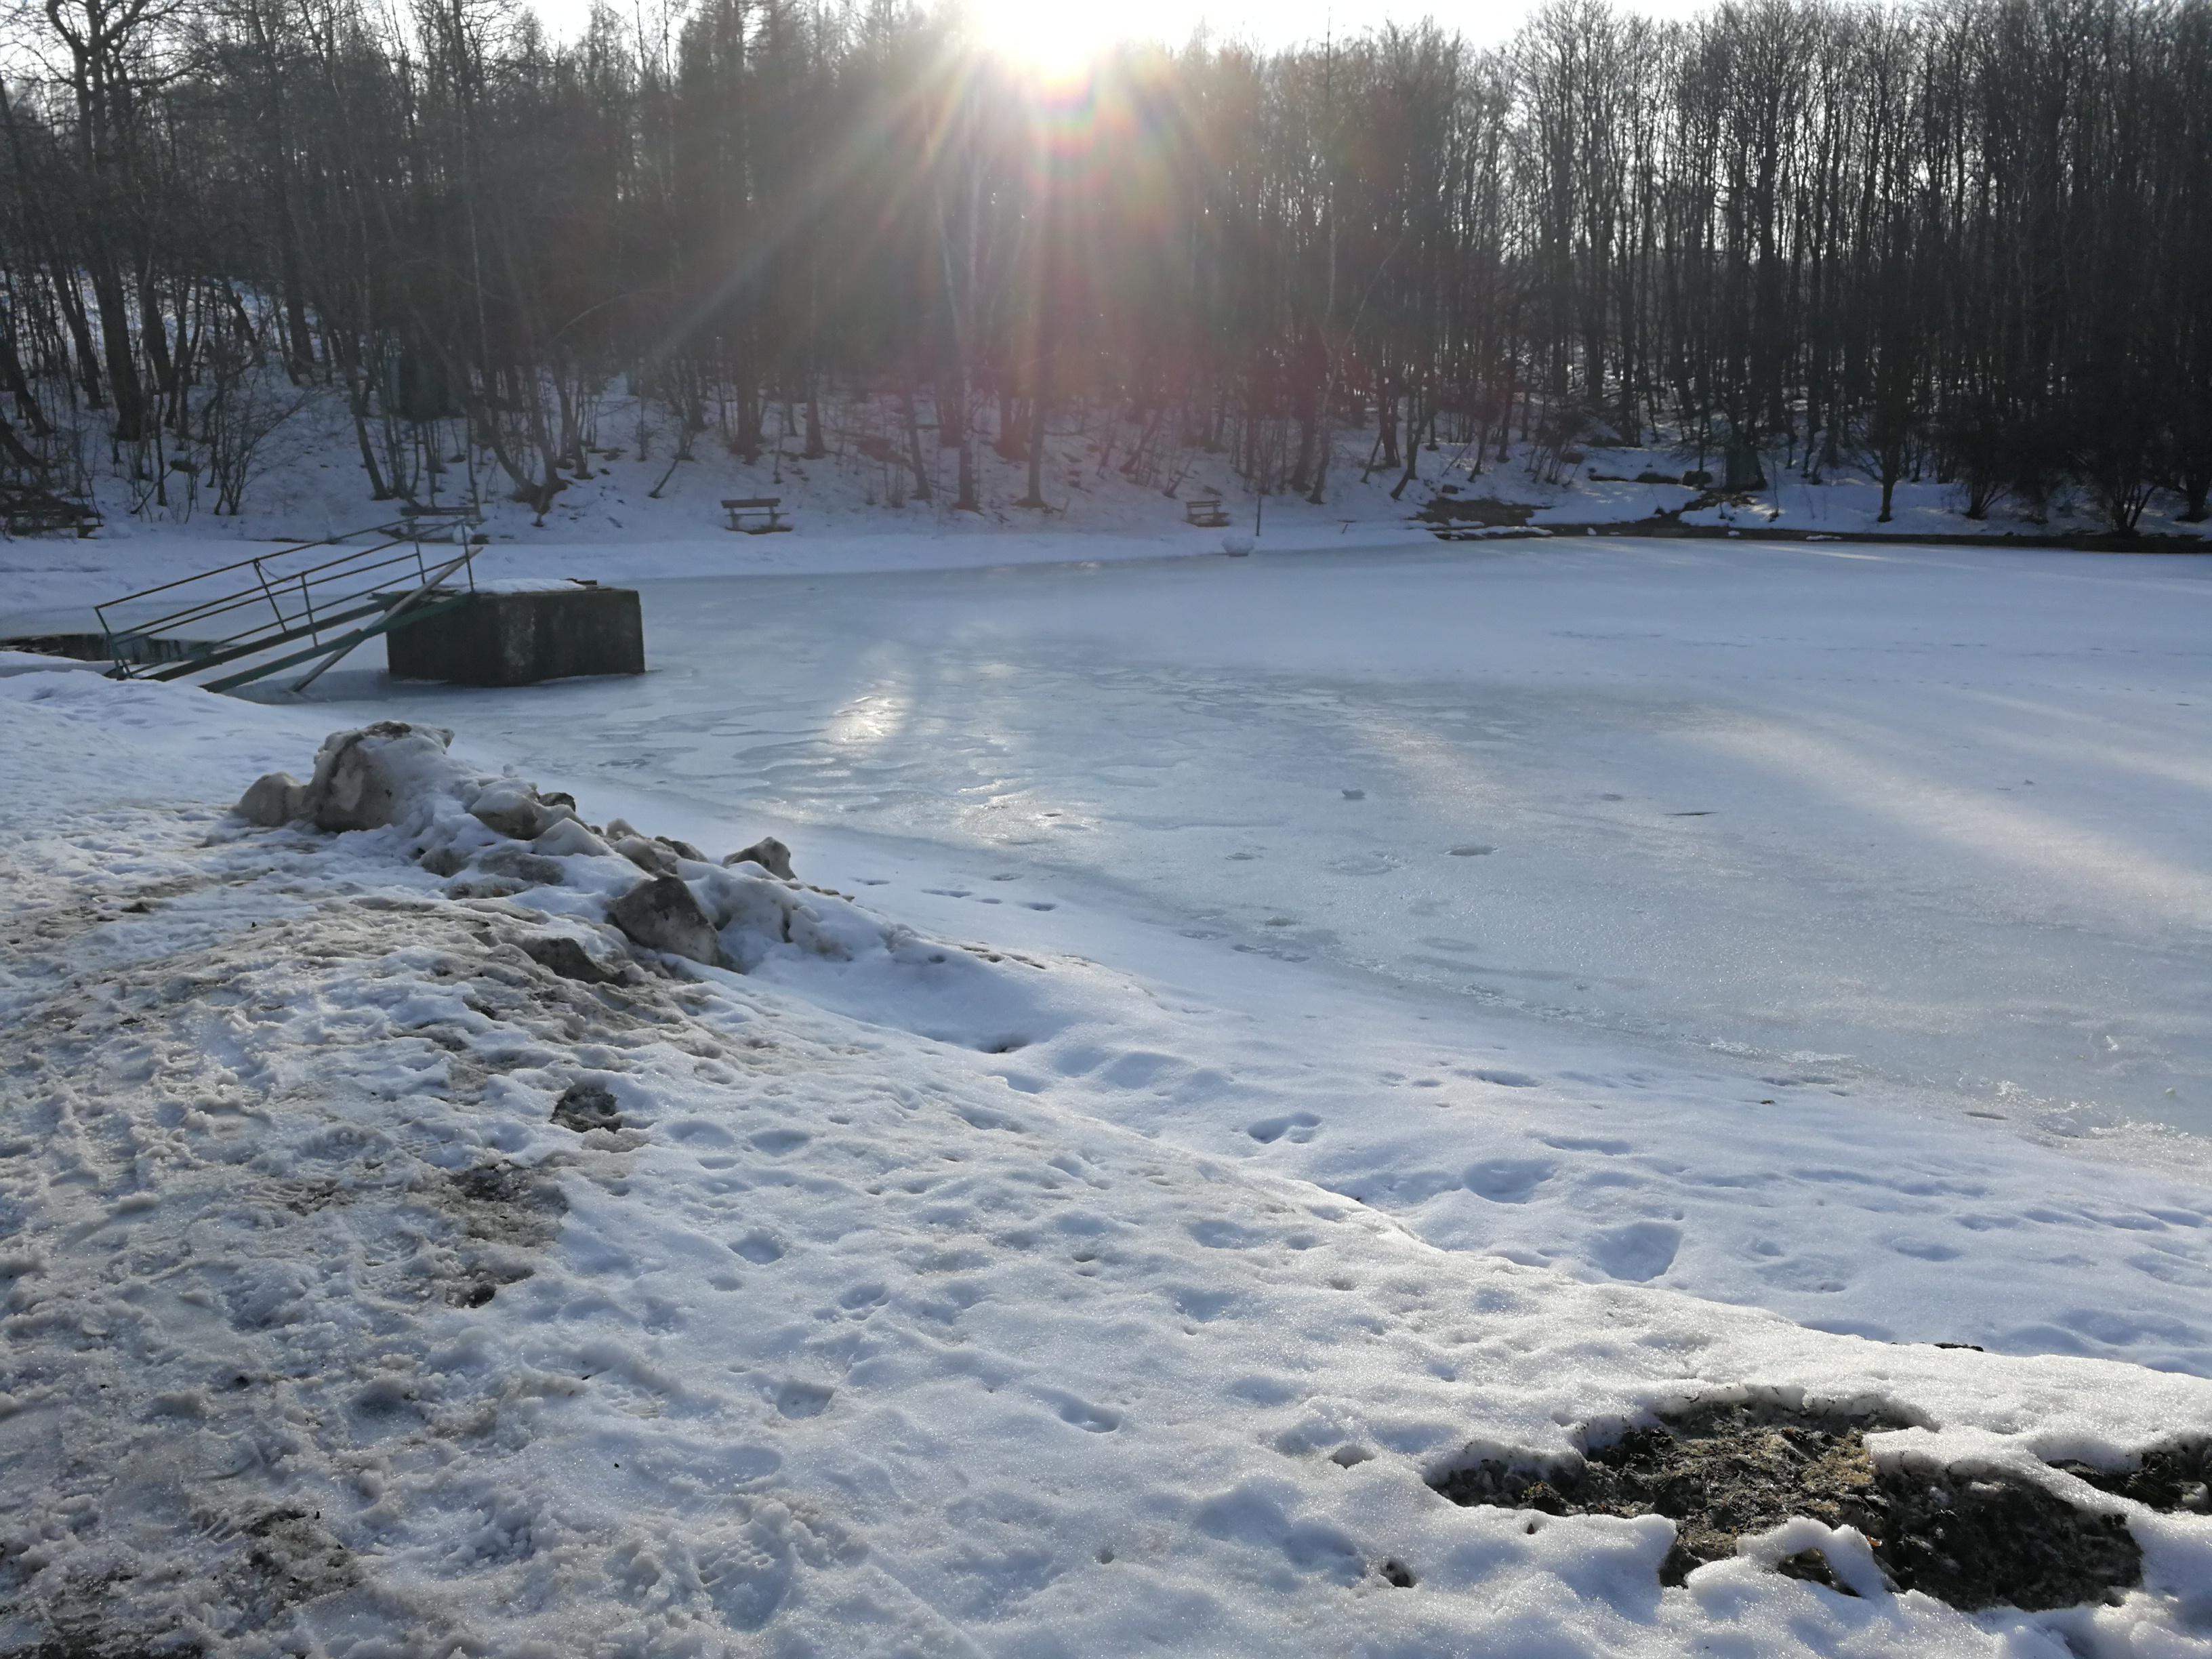 A dew pont at Zochova chata - the winter